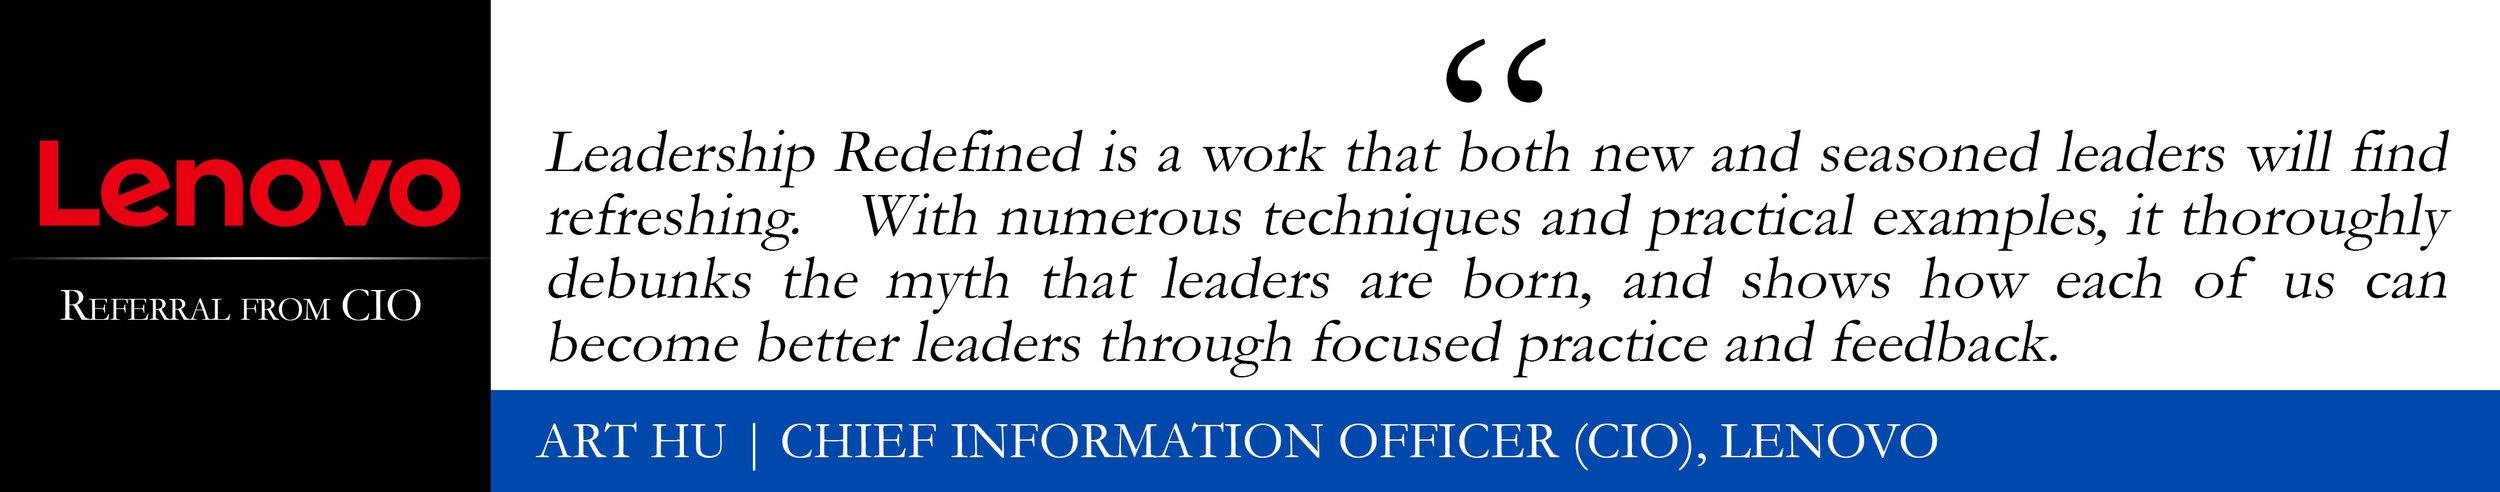 Leadership Redefined Quote 5.jpg